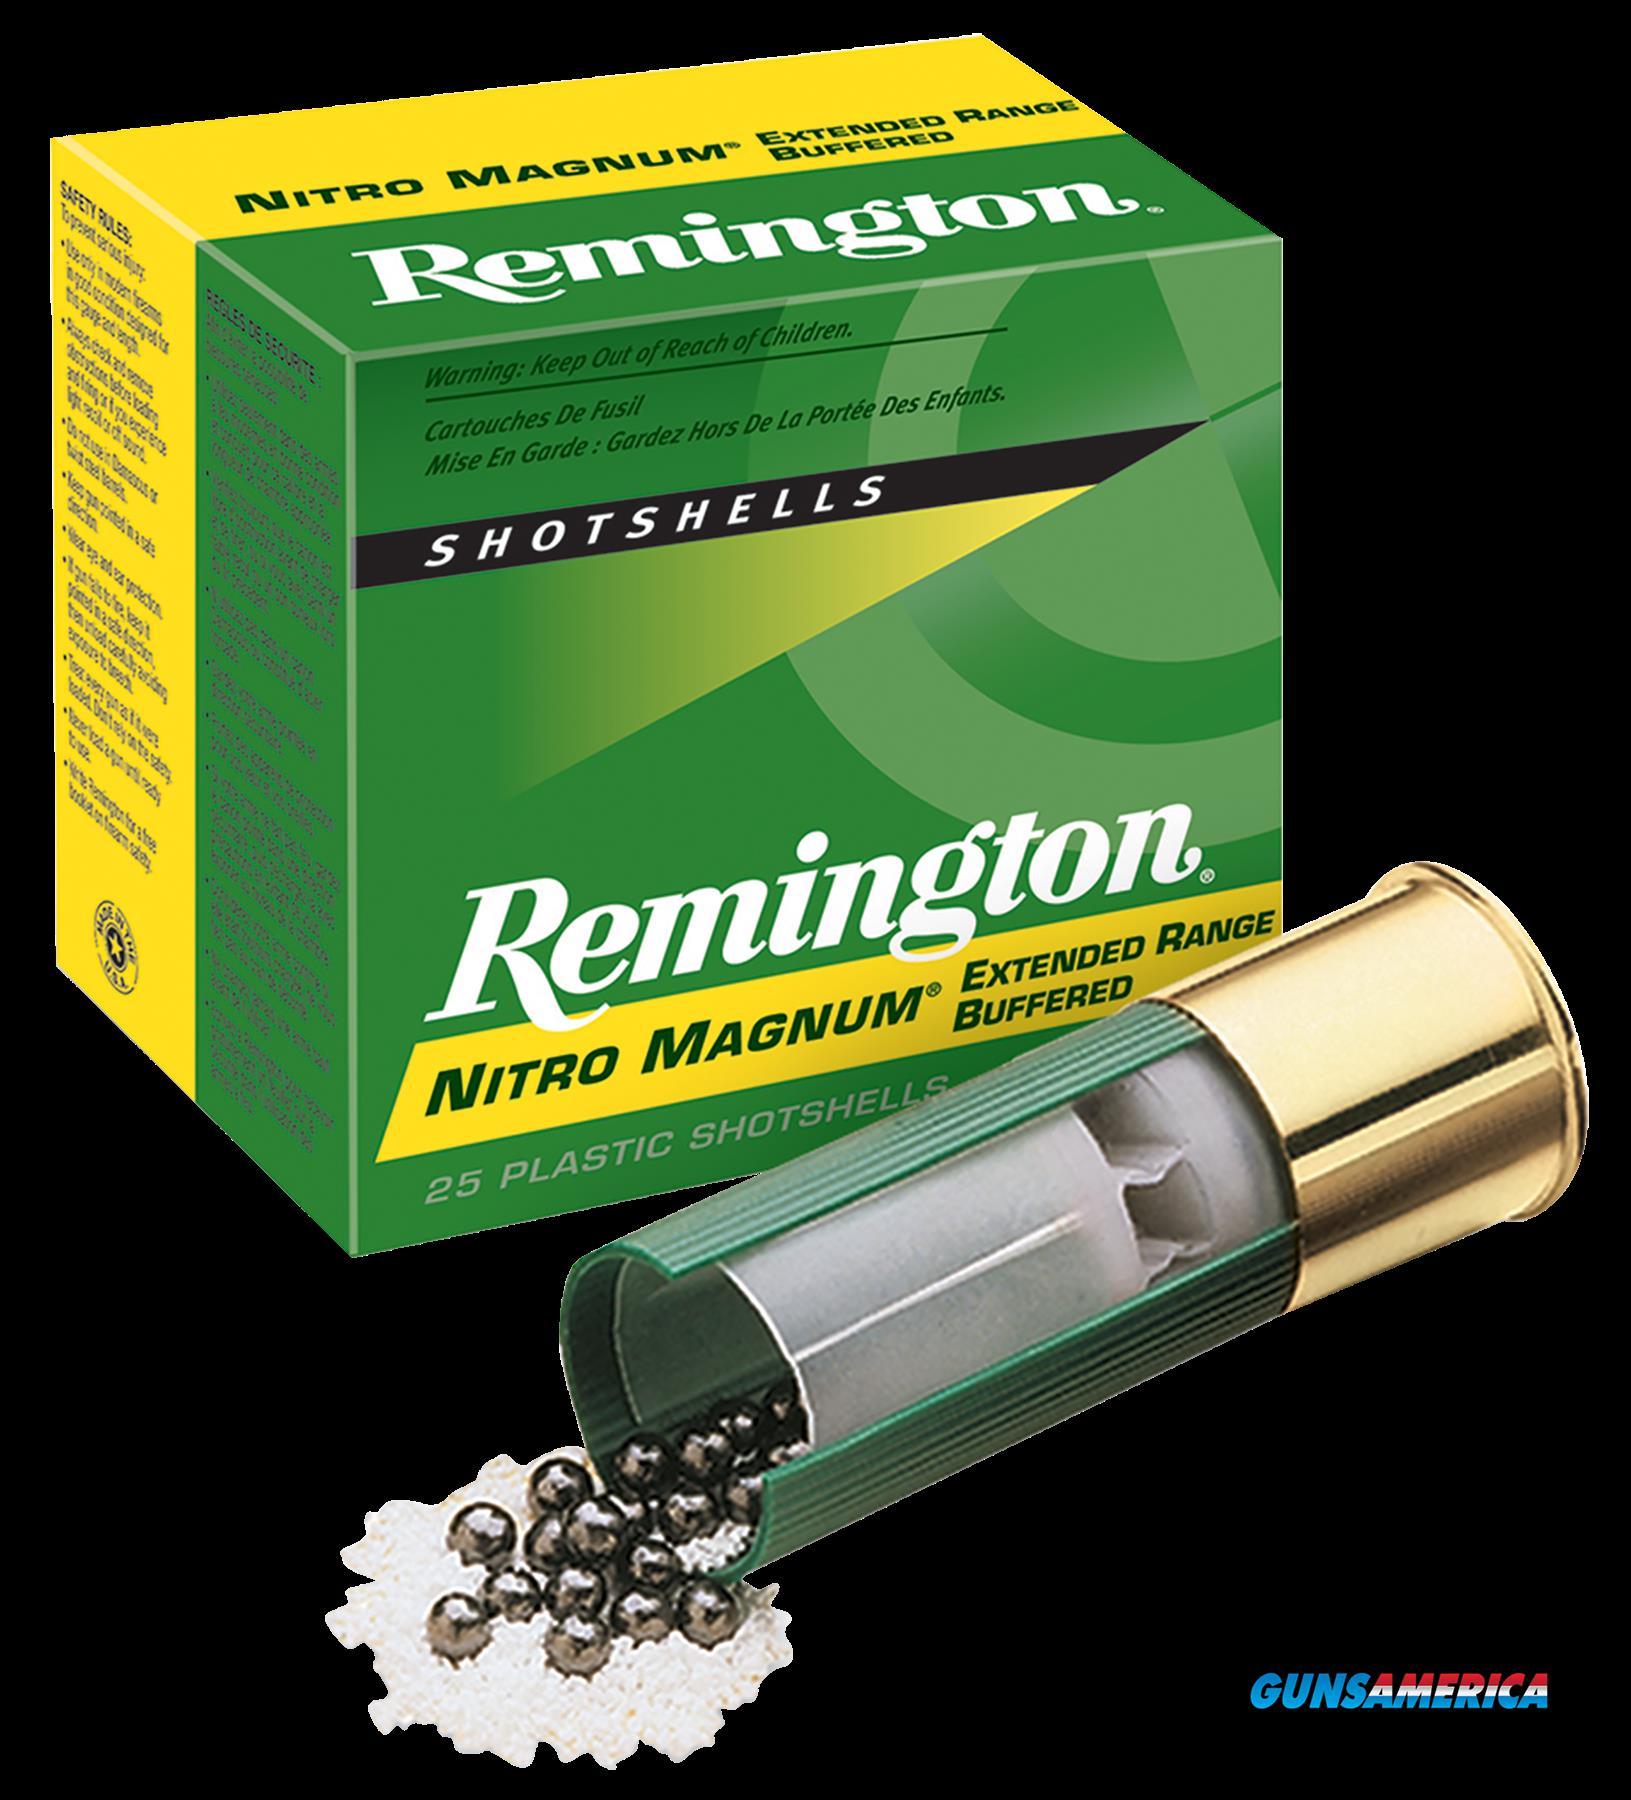 Remington Ammunition Nitro Mag, Rem 20664 Nm20s4    20   Mag    4      25-10  Guns > Pistols > 1911 Pistol Copies (non-Colt)